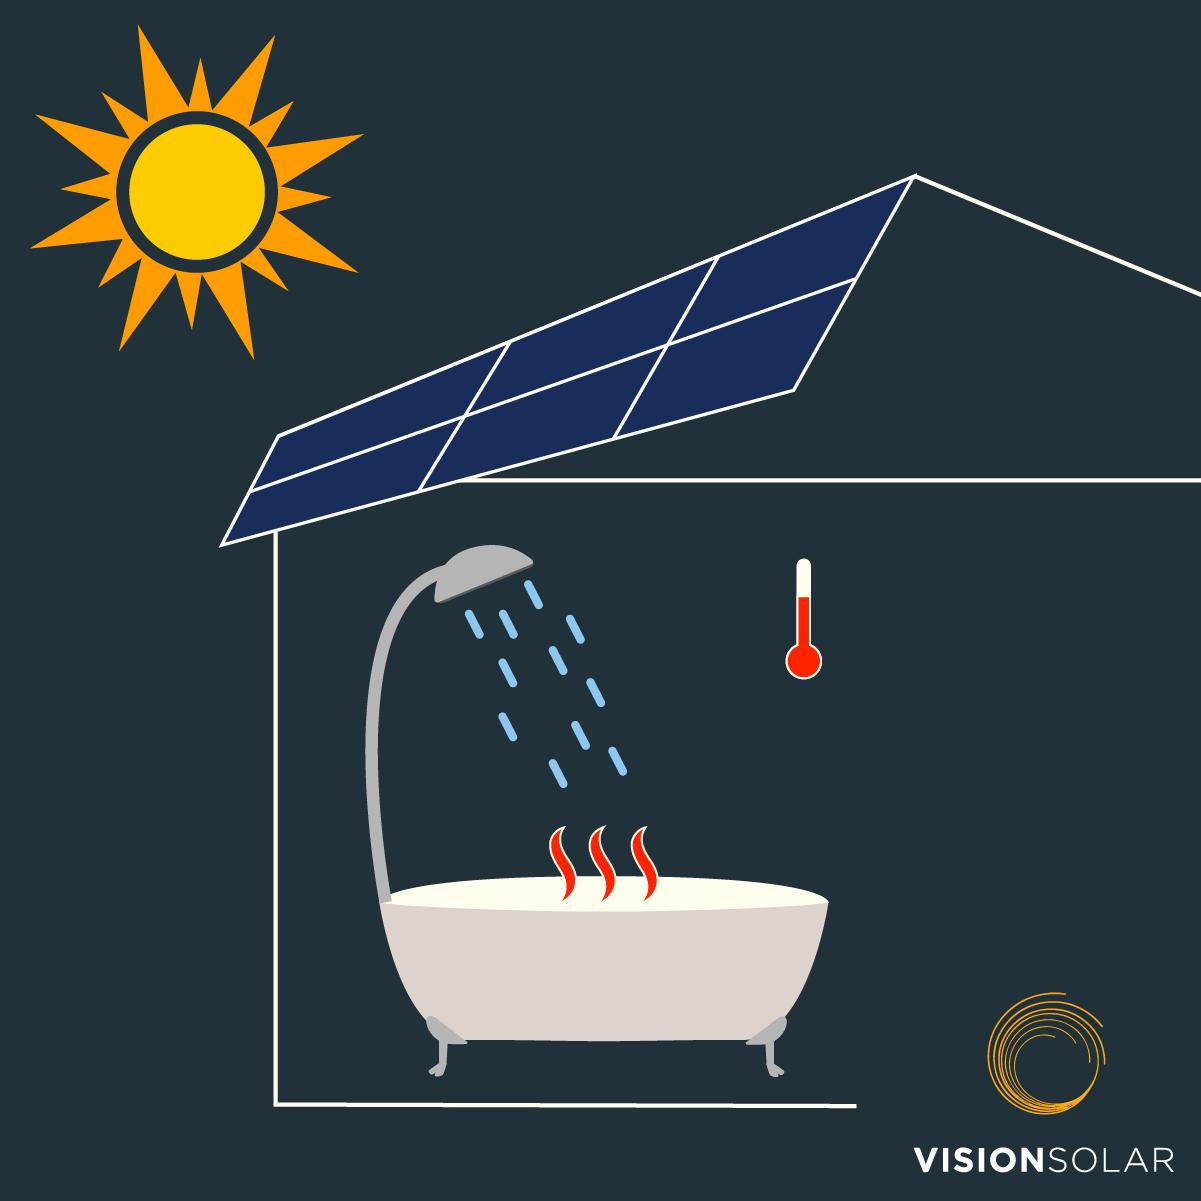 Vision Solar : 2 Types of Solar Energy